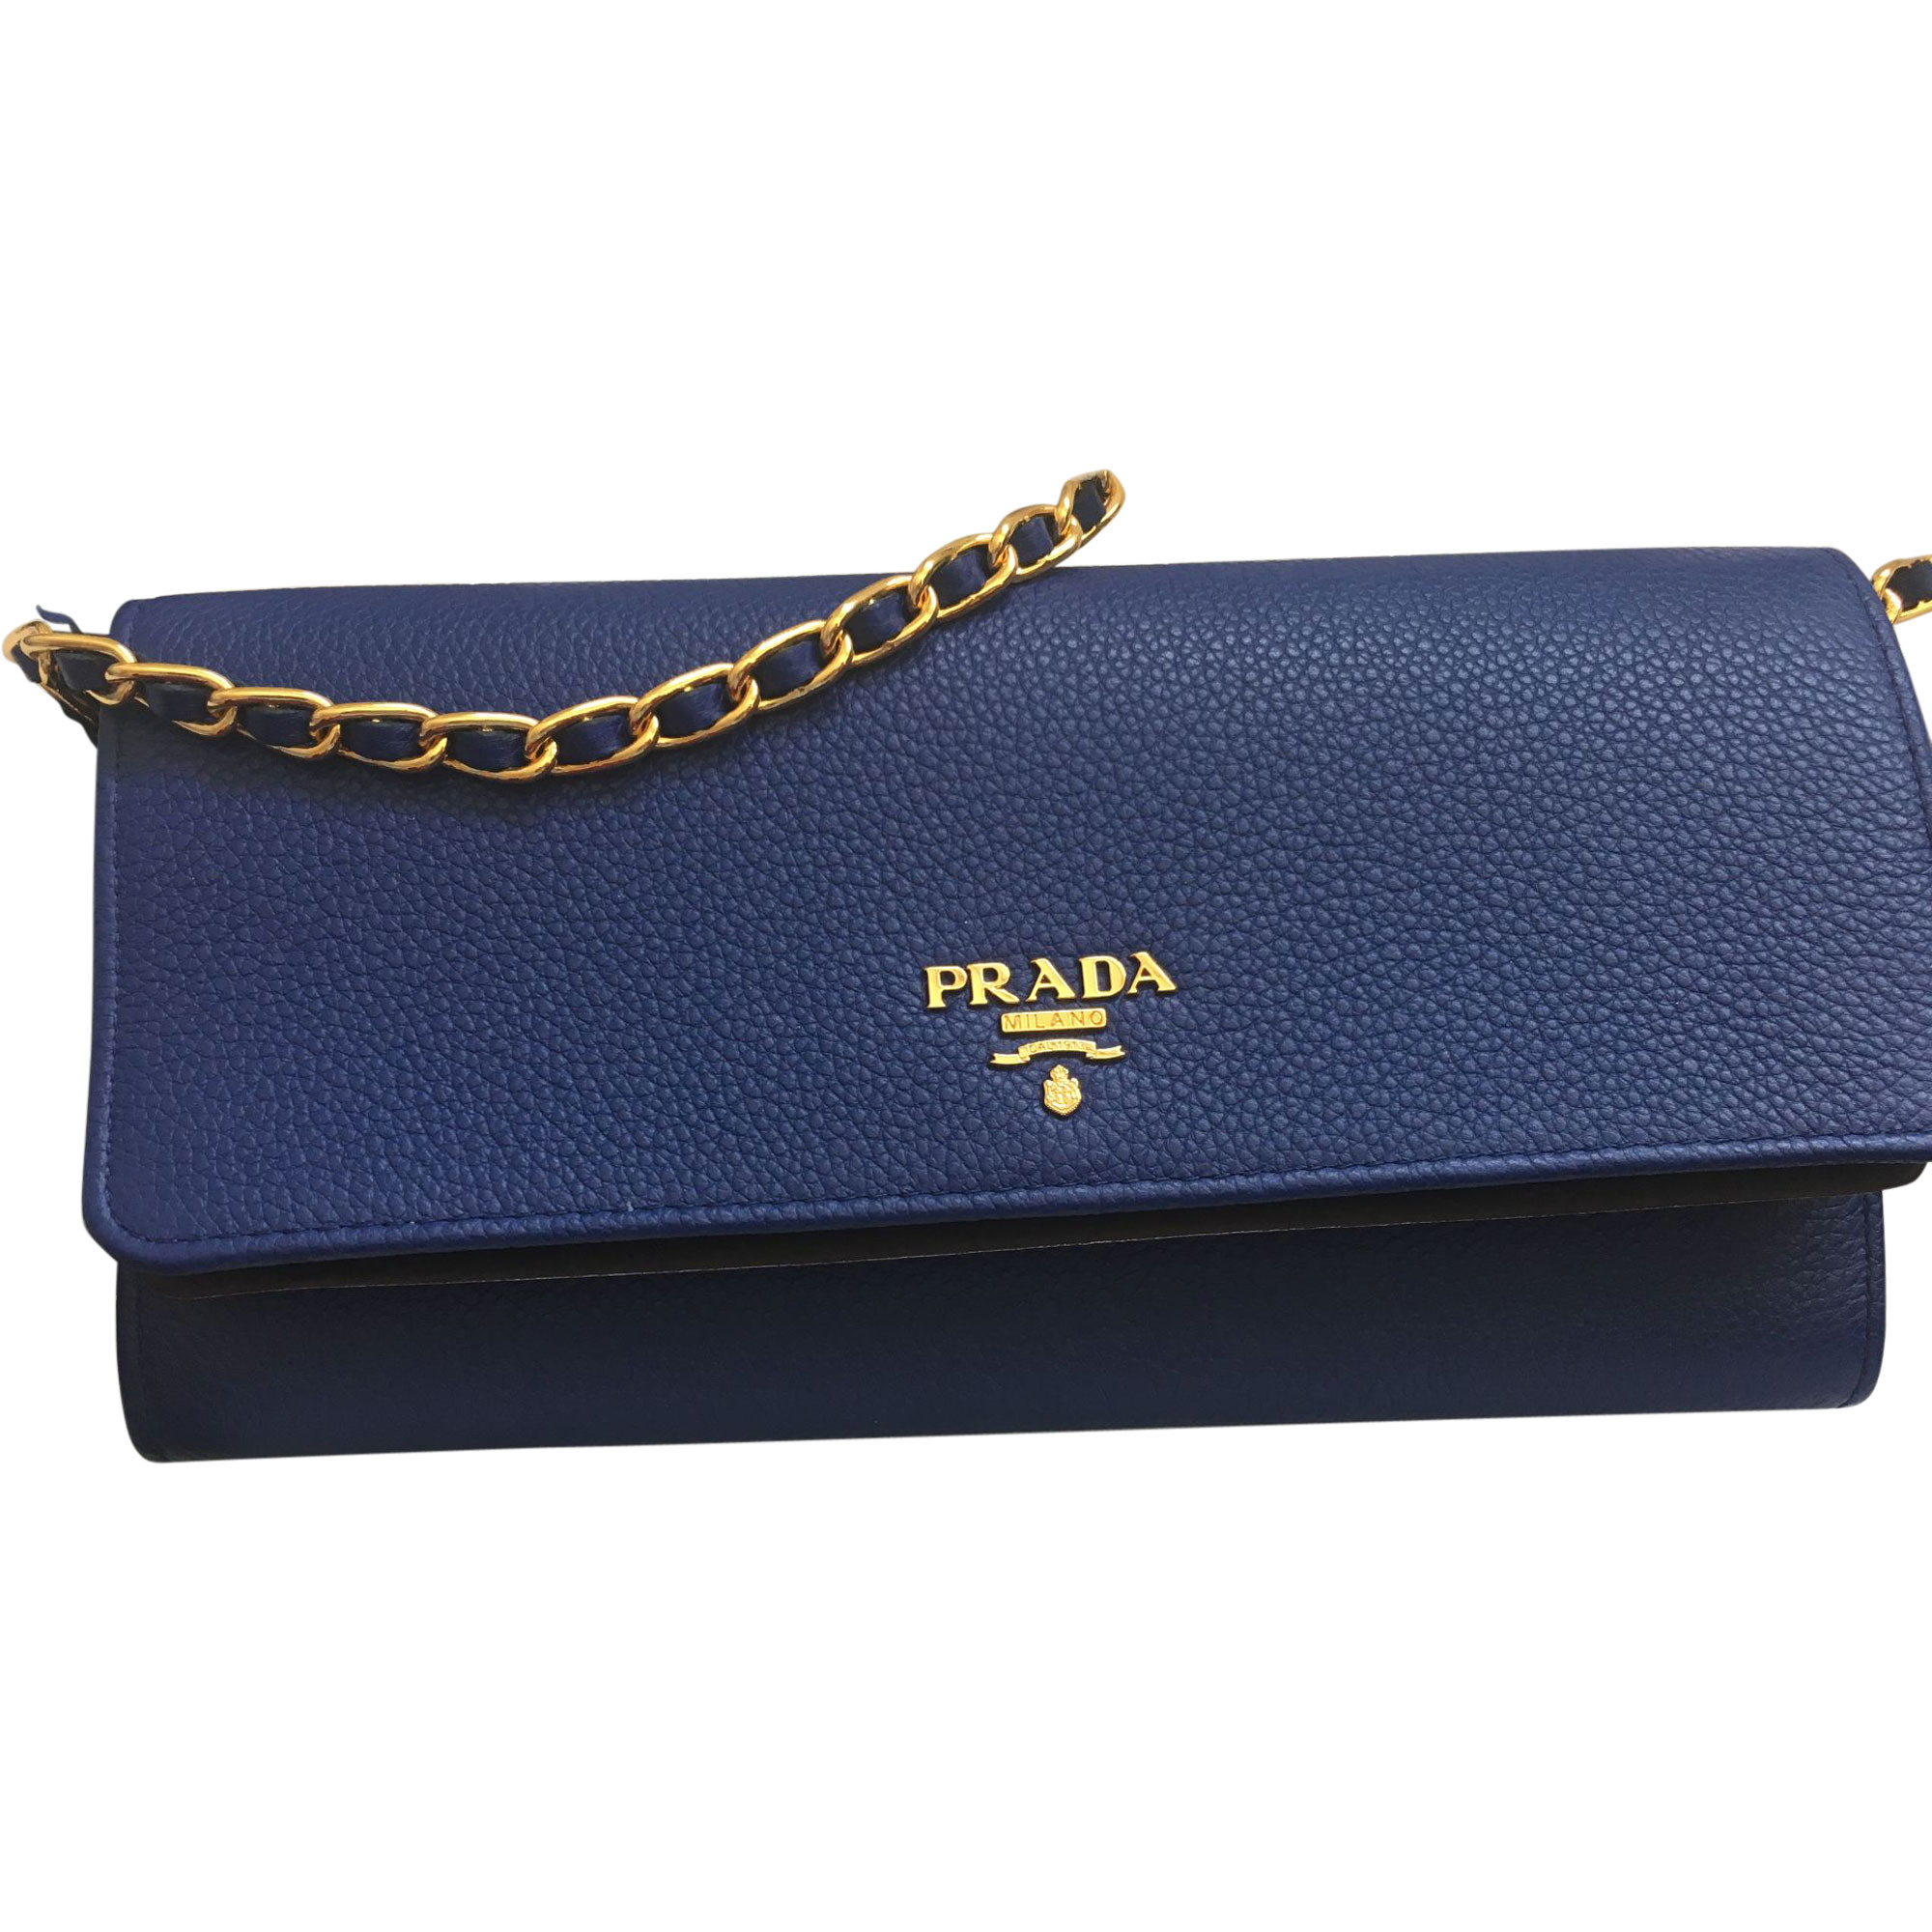 Sac pochette en cuir PRADA Bleu, bleu marine, bleu turquoise 1be0d9be941